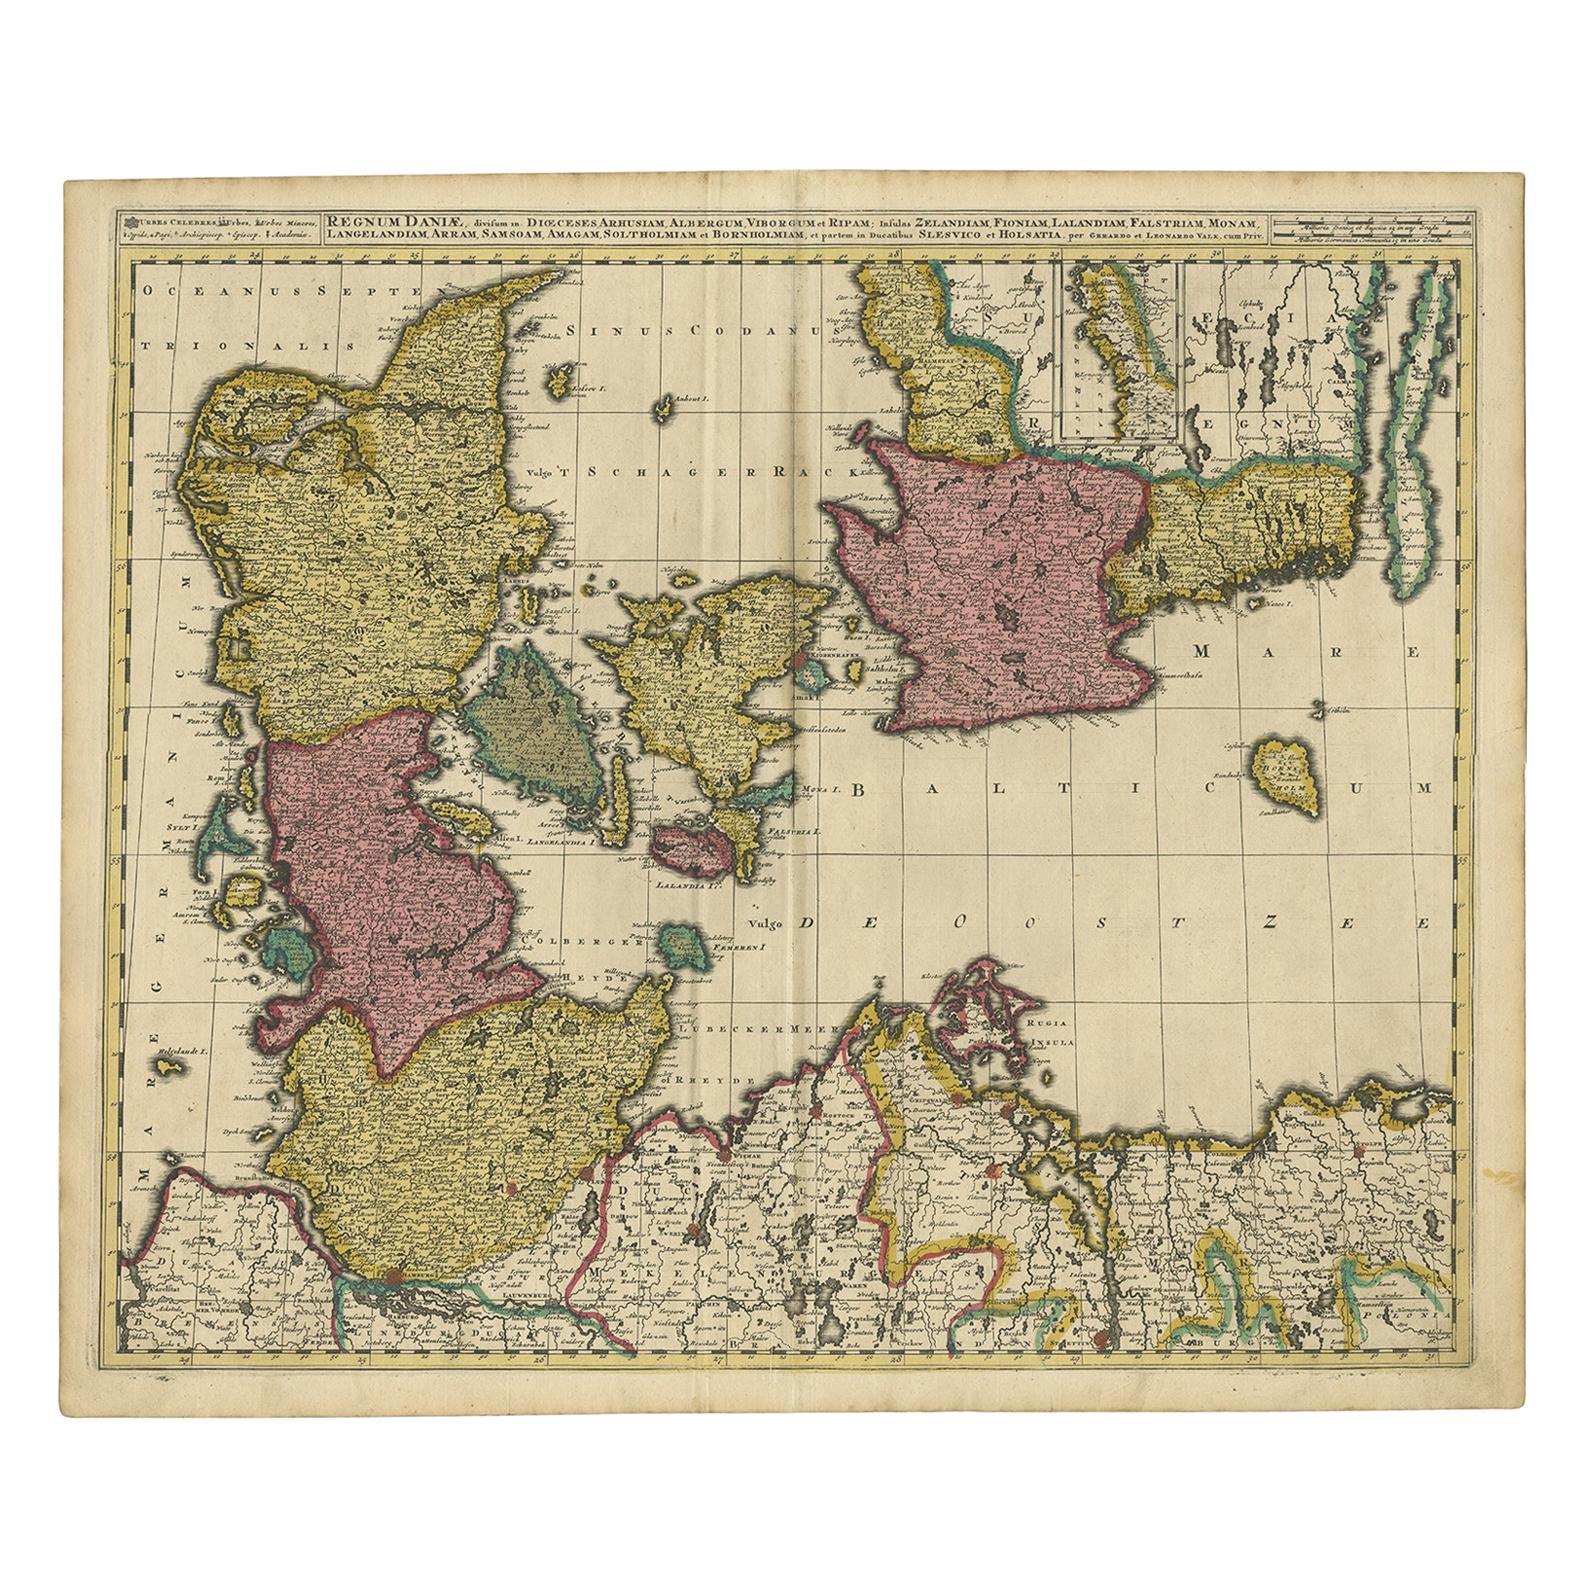 Antique Map of Denmark by Valk 'circa 1690'